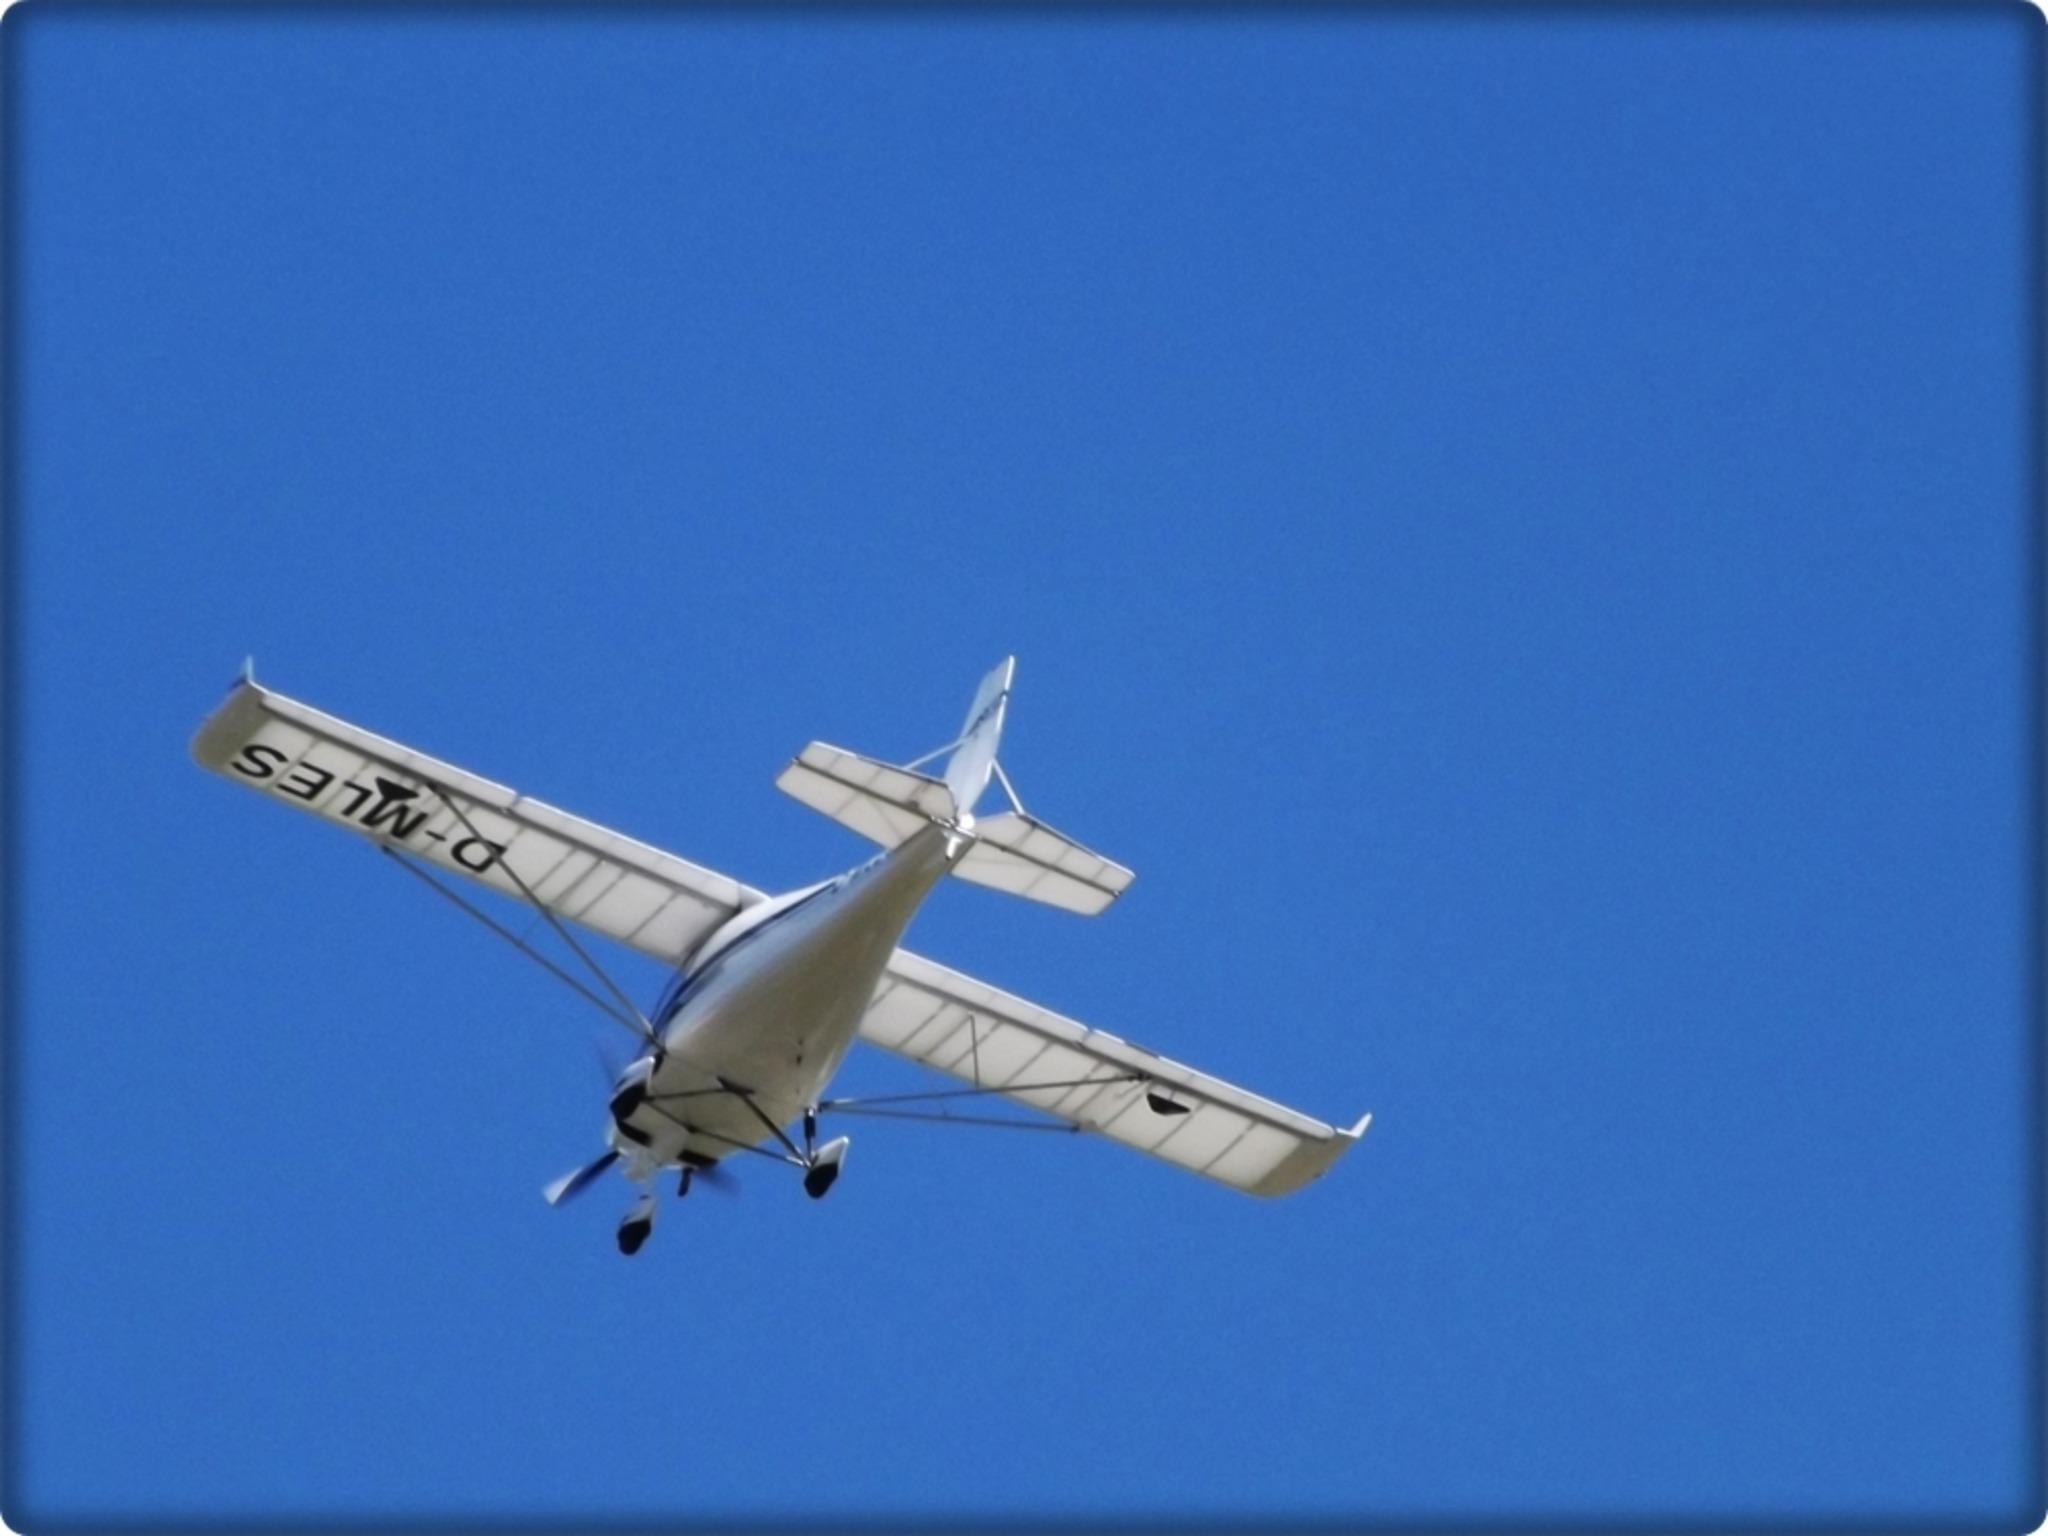 Flugzeuge Am Himmel Heute